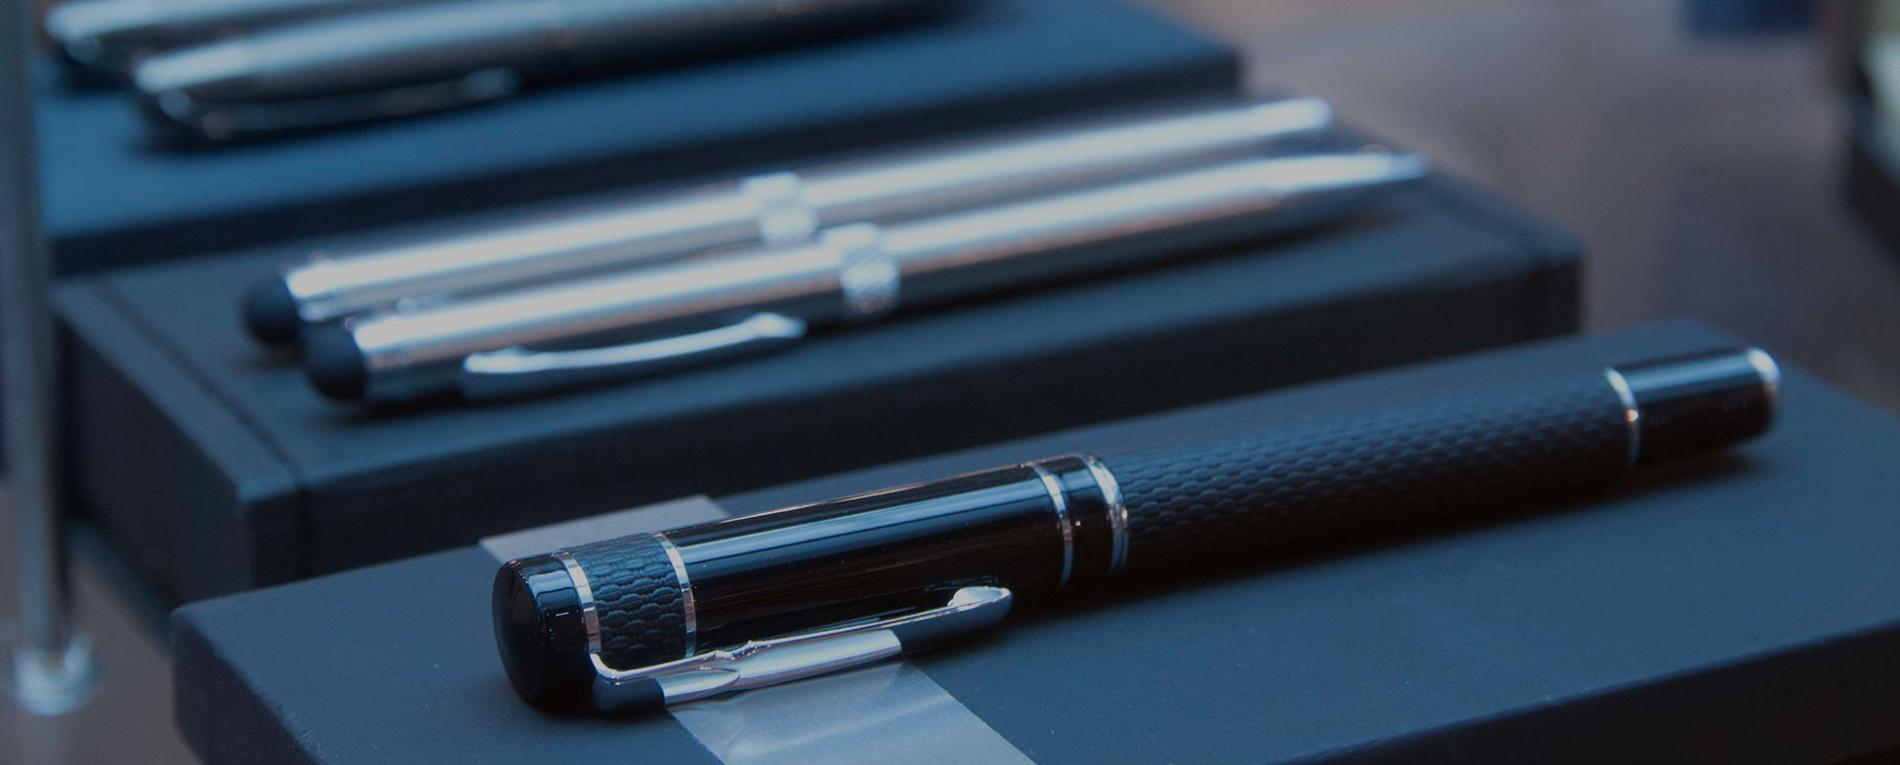 Pen sample